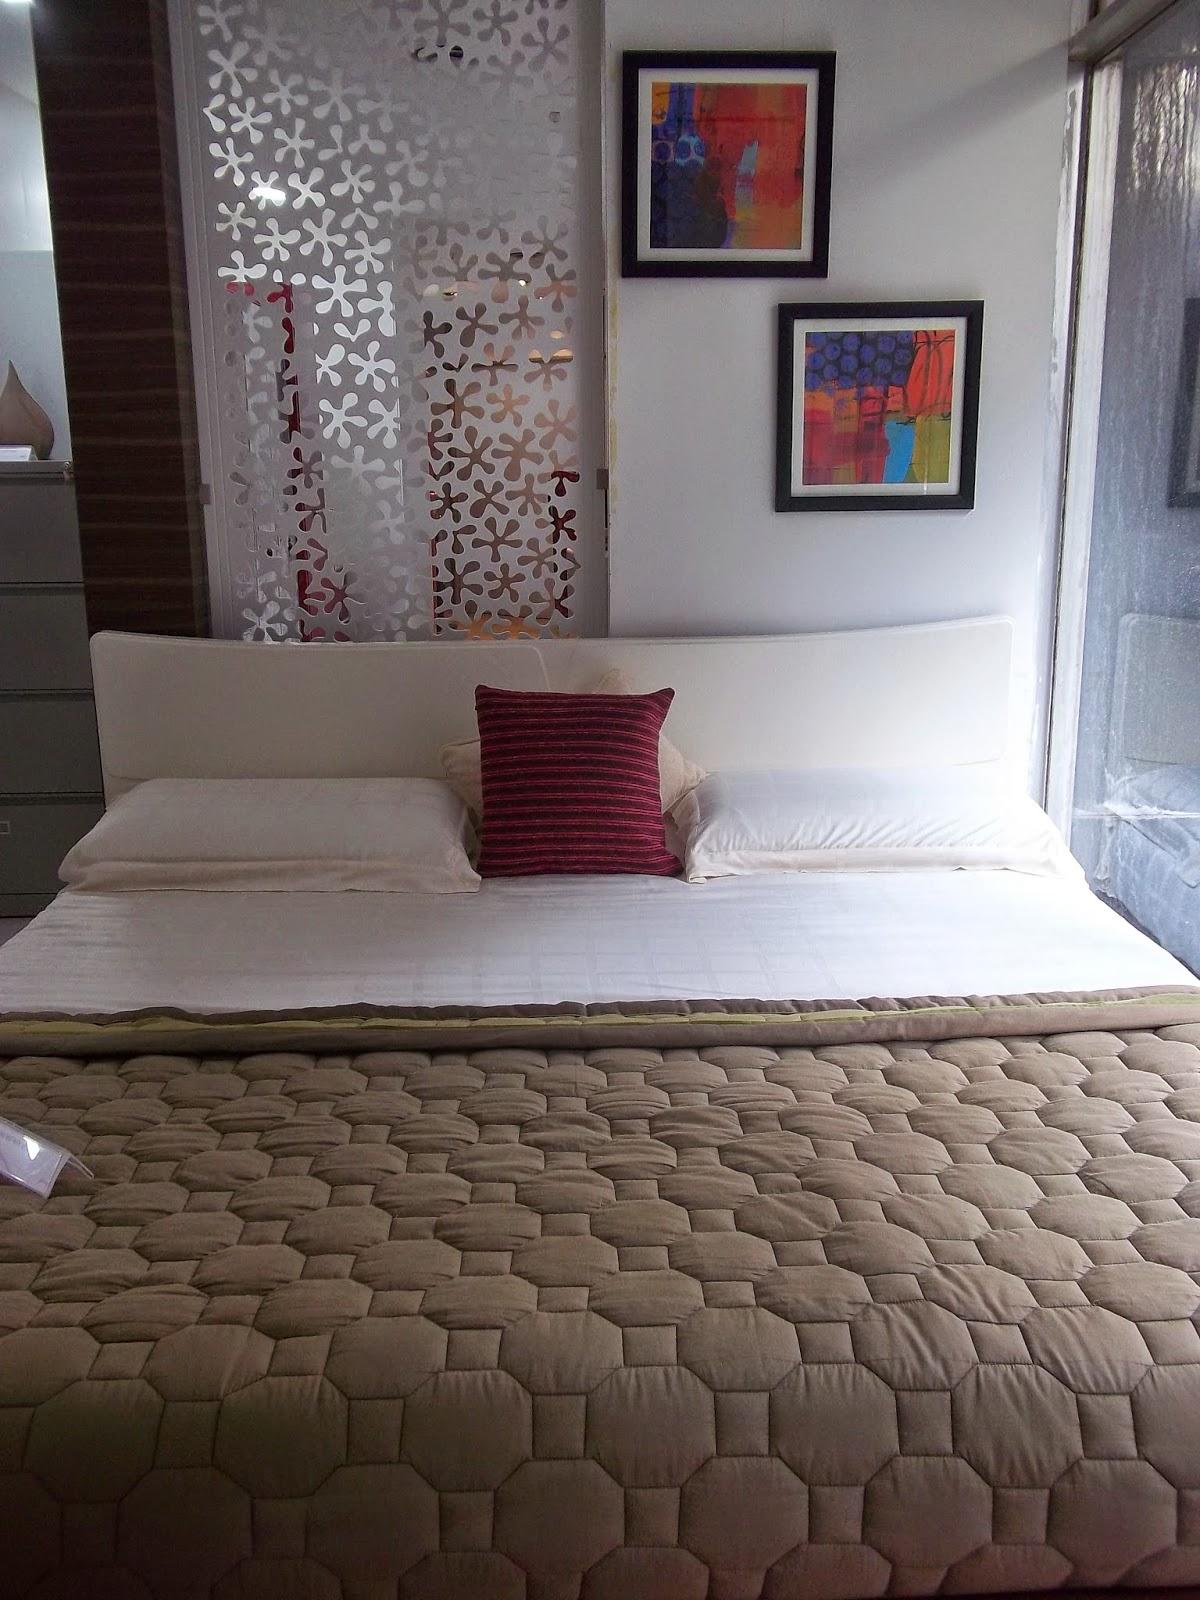 Godrej Chair Accessories Gold Velvet Spirit Of Mumbai Dream Home With Interio